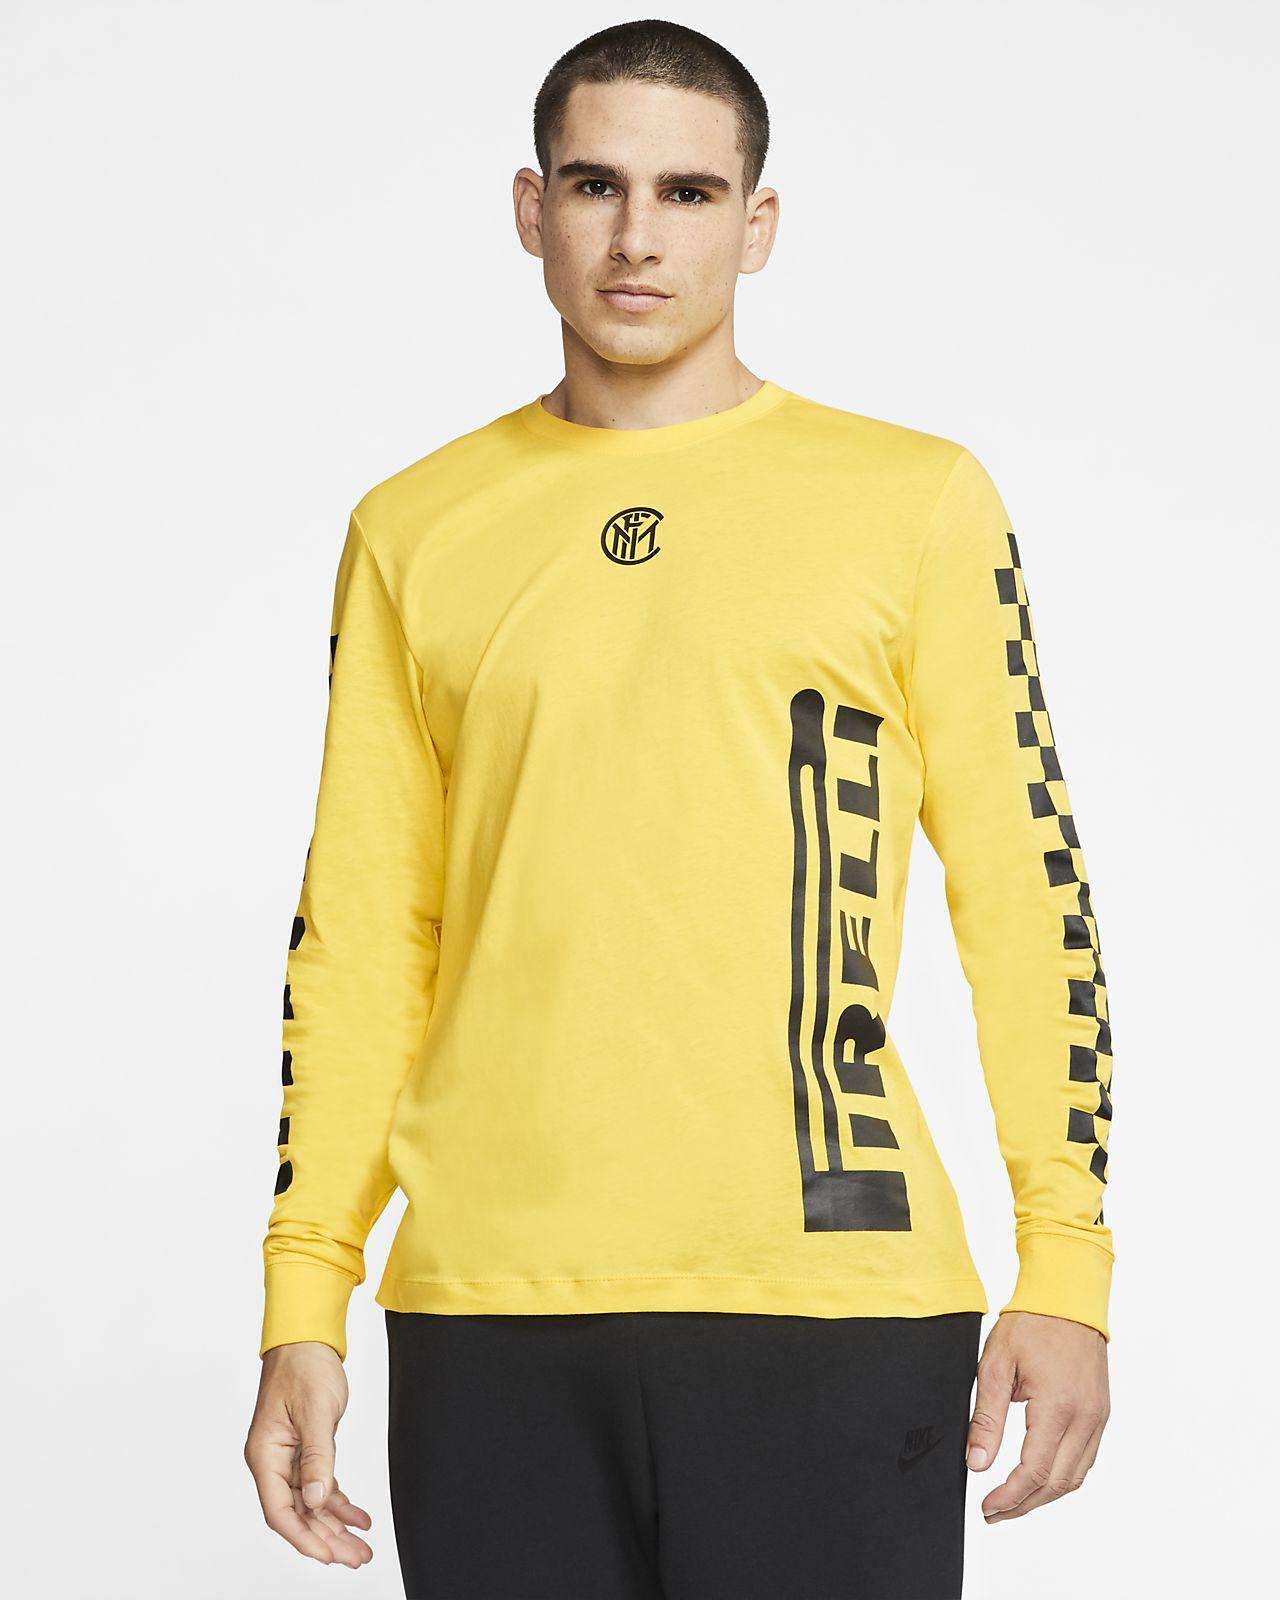 info for bb6f2 19668 Inter Milan Men's Long-Sleeve T-Shirt